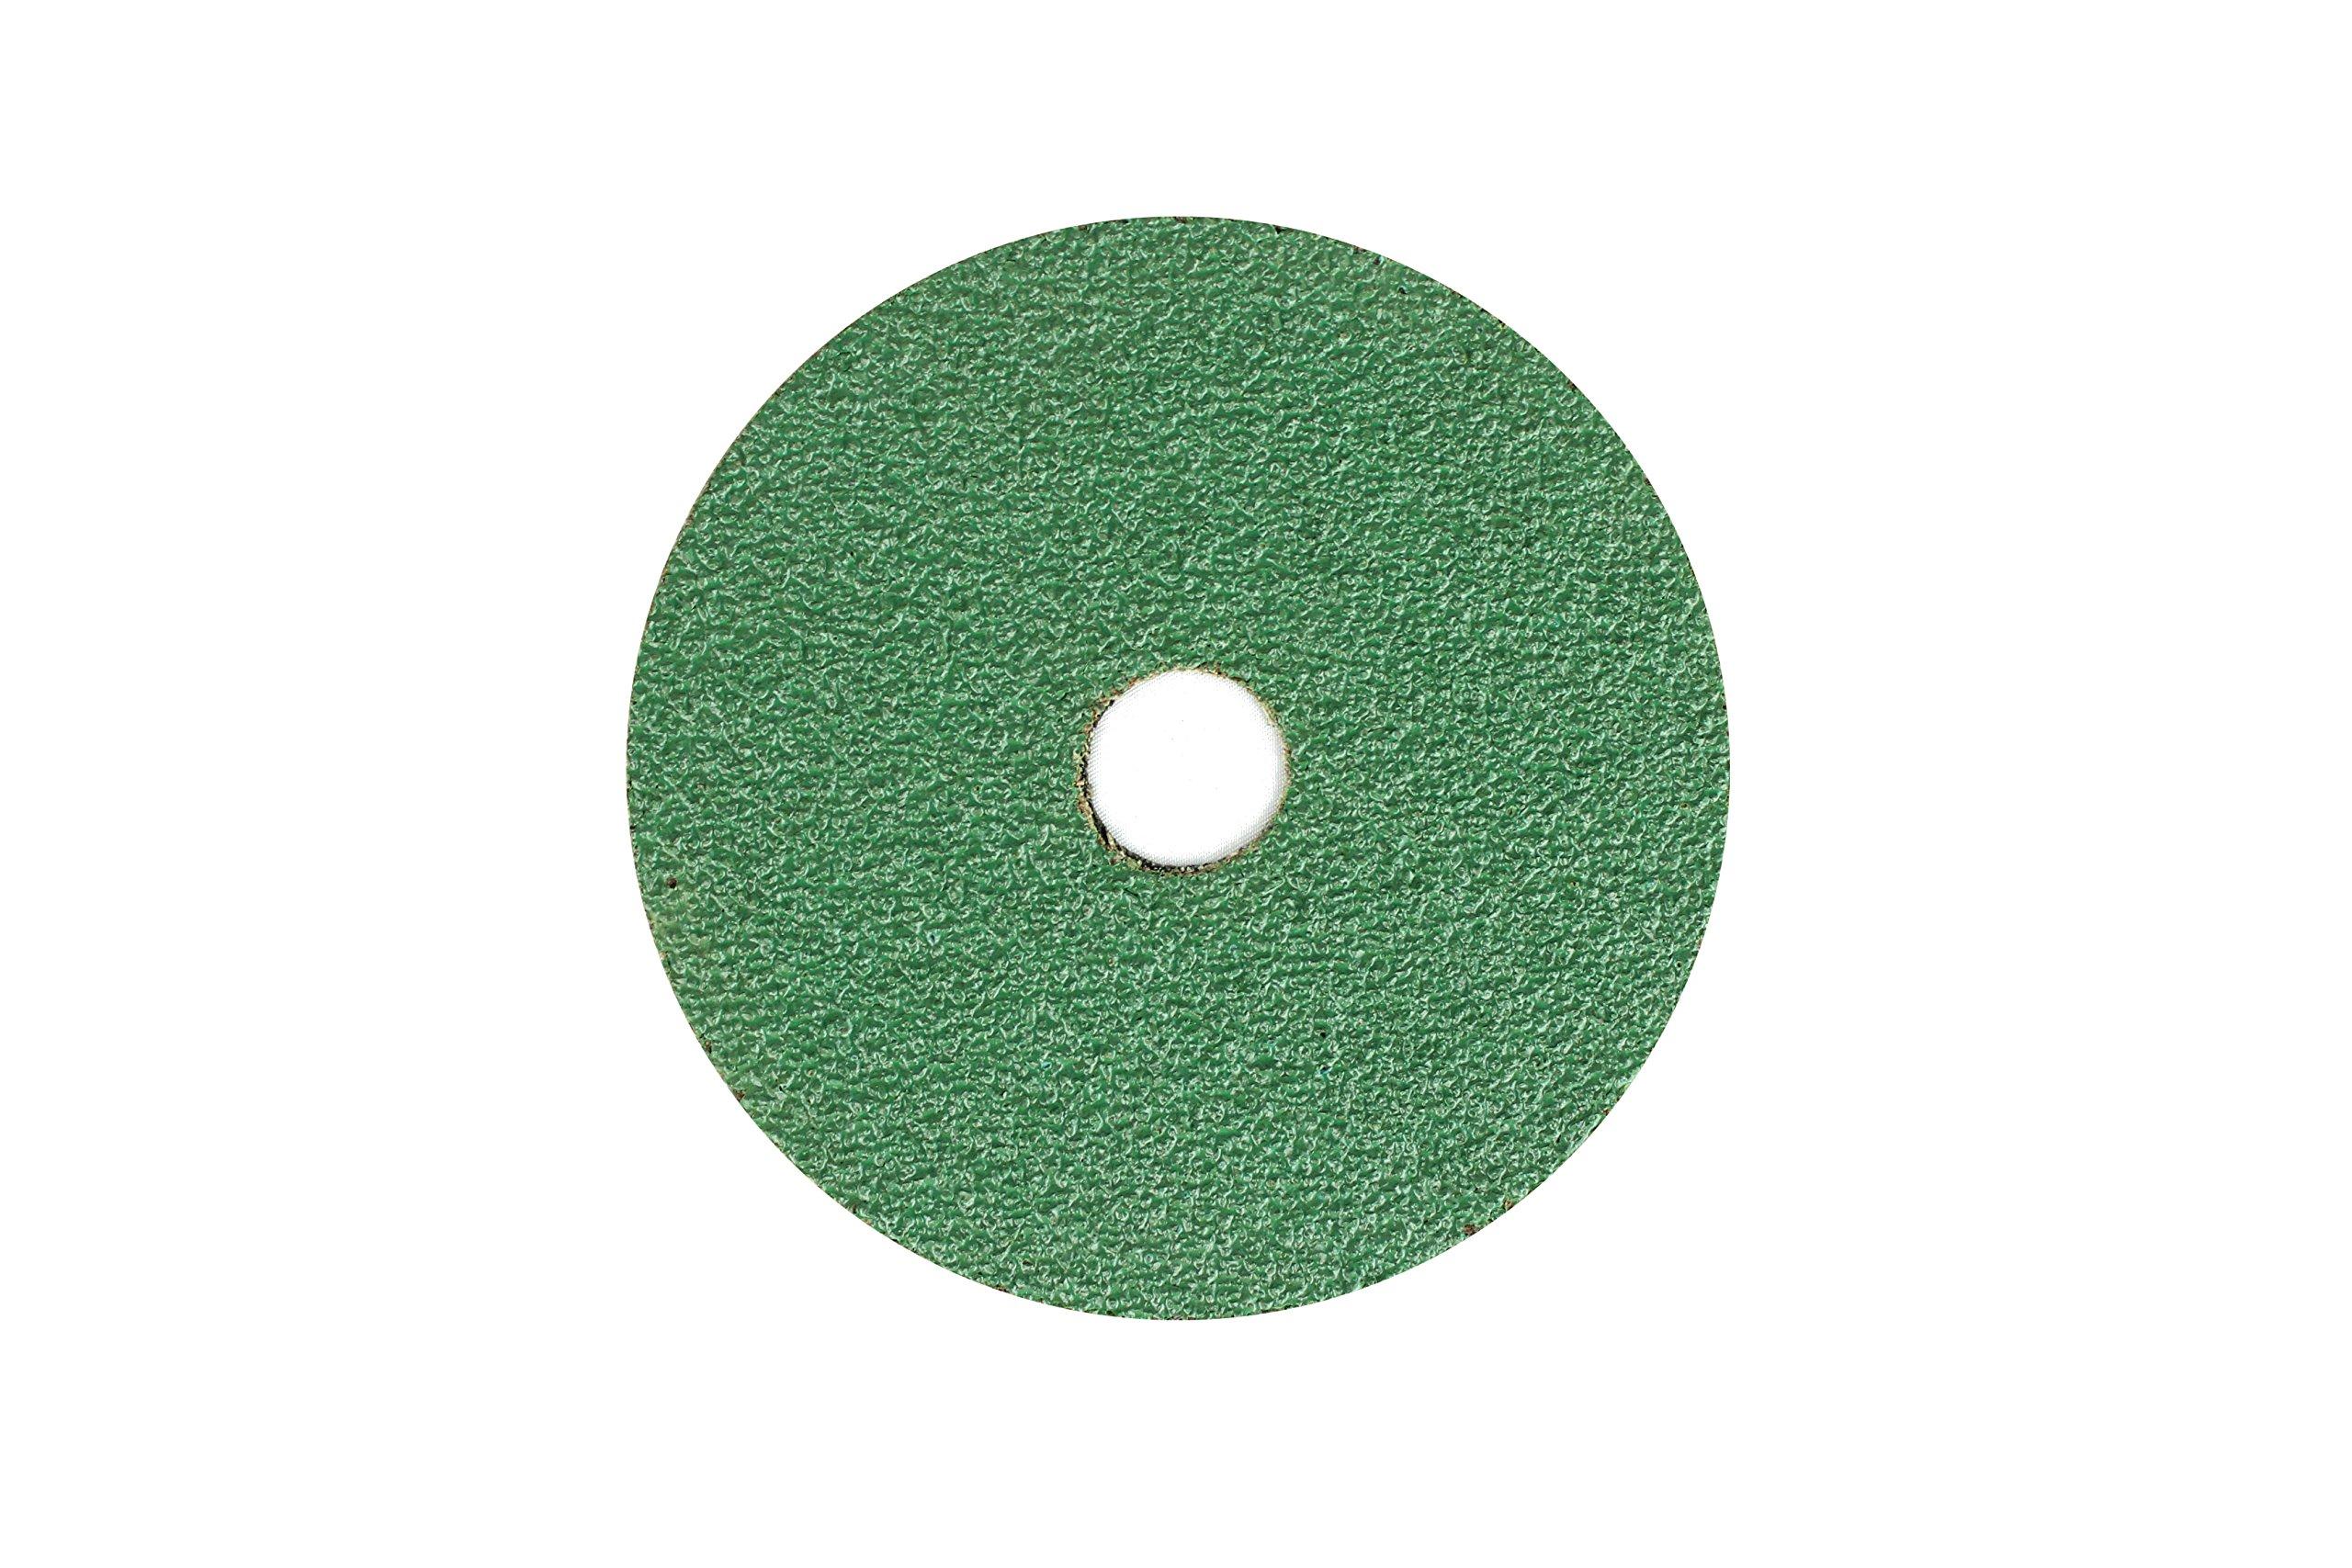 Sunmight 72301 1 Pack 5'' Alumina Zirconia Fibre Disc (Sundisc Grit 24) by Sunmight